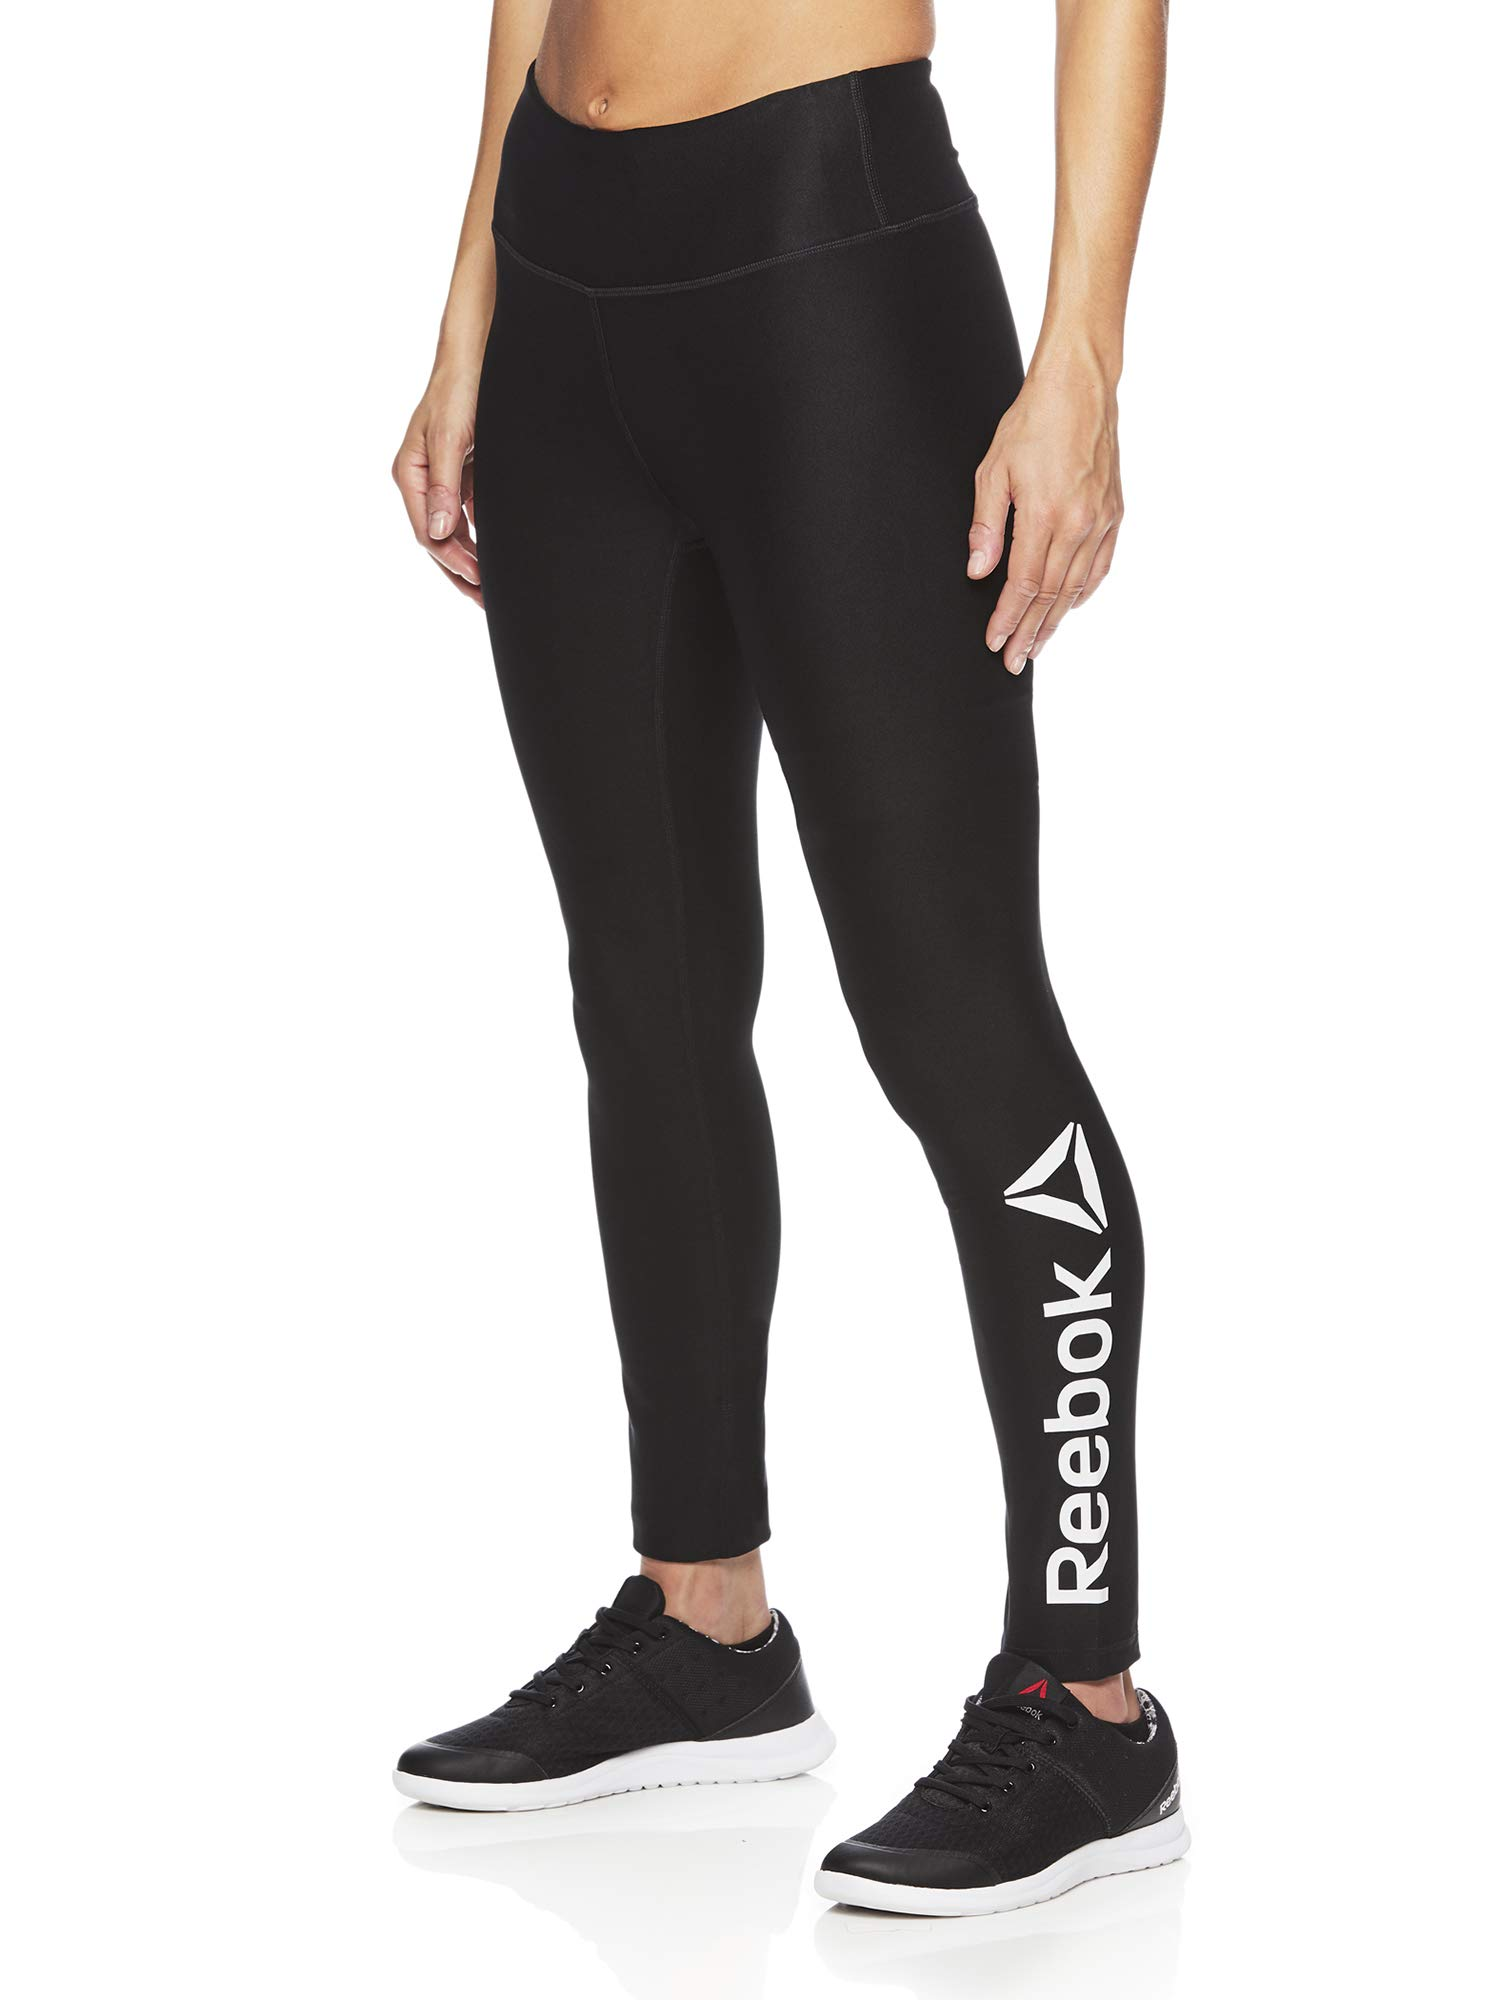 Reebok Women's Legging Full Length Performance Compression Pants by Reebok